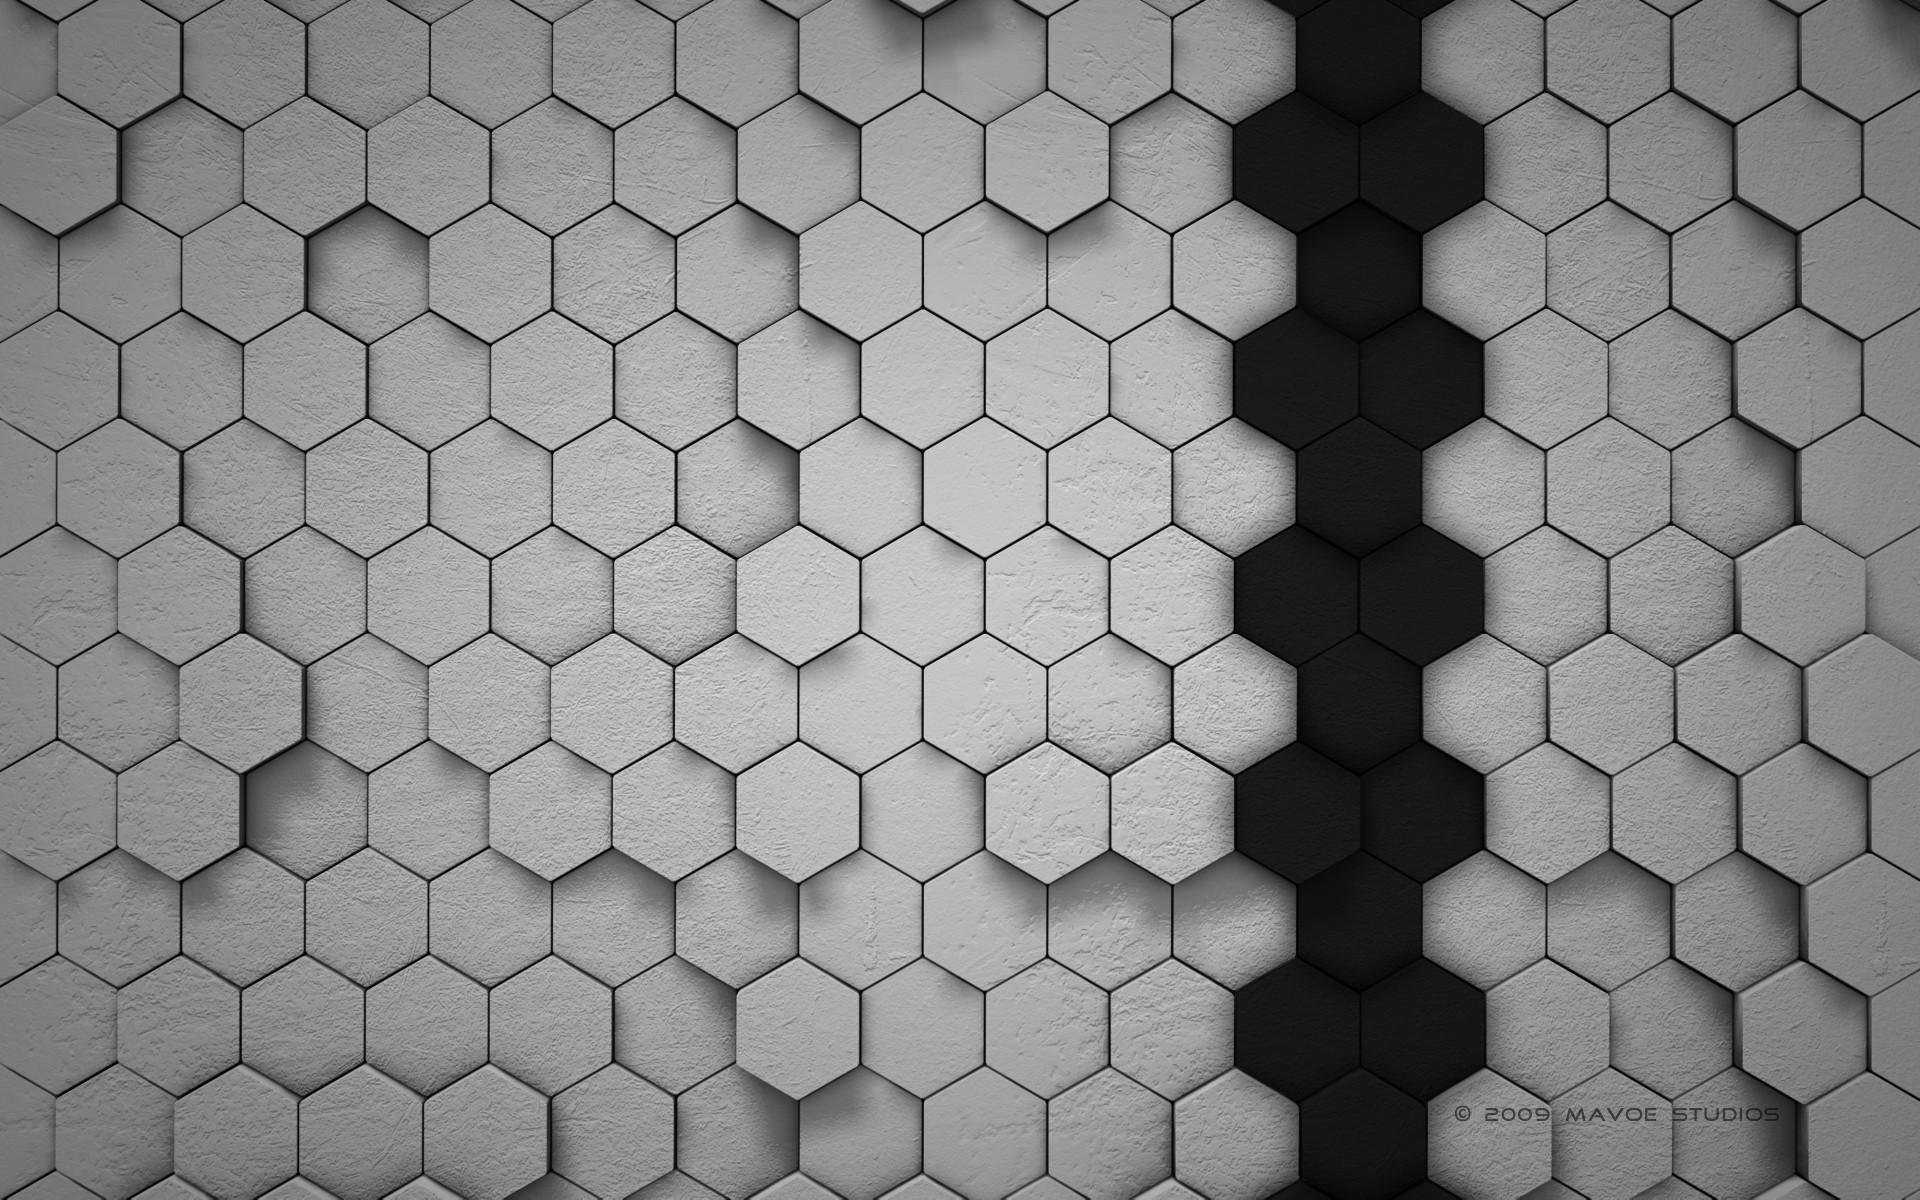 Wallpaper Honeycombs, gray background